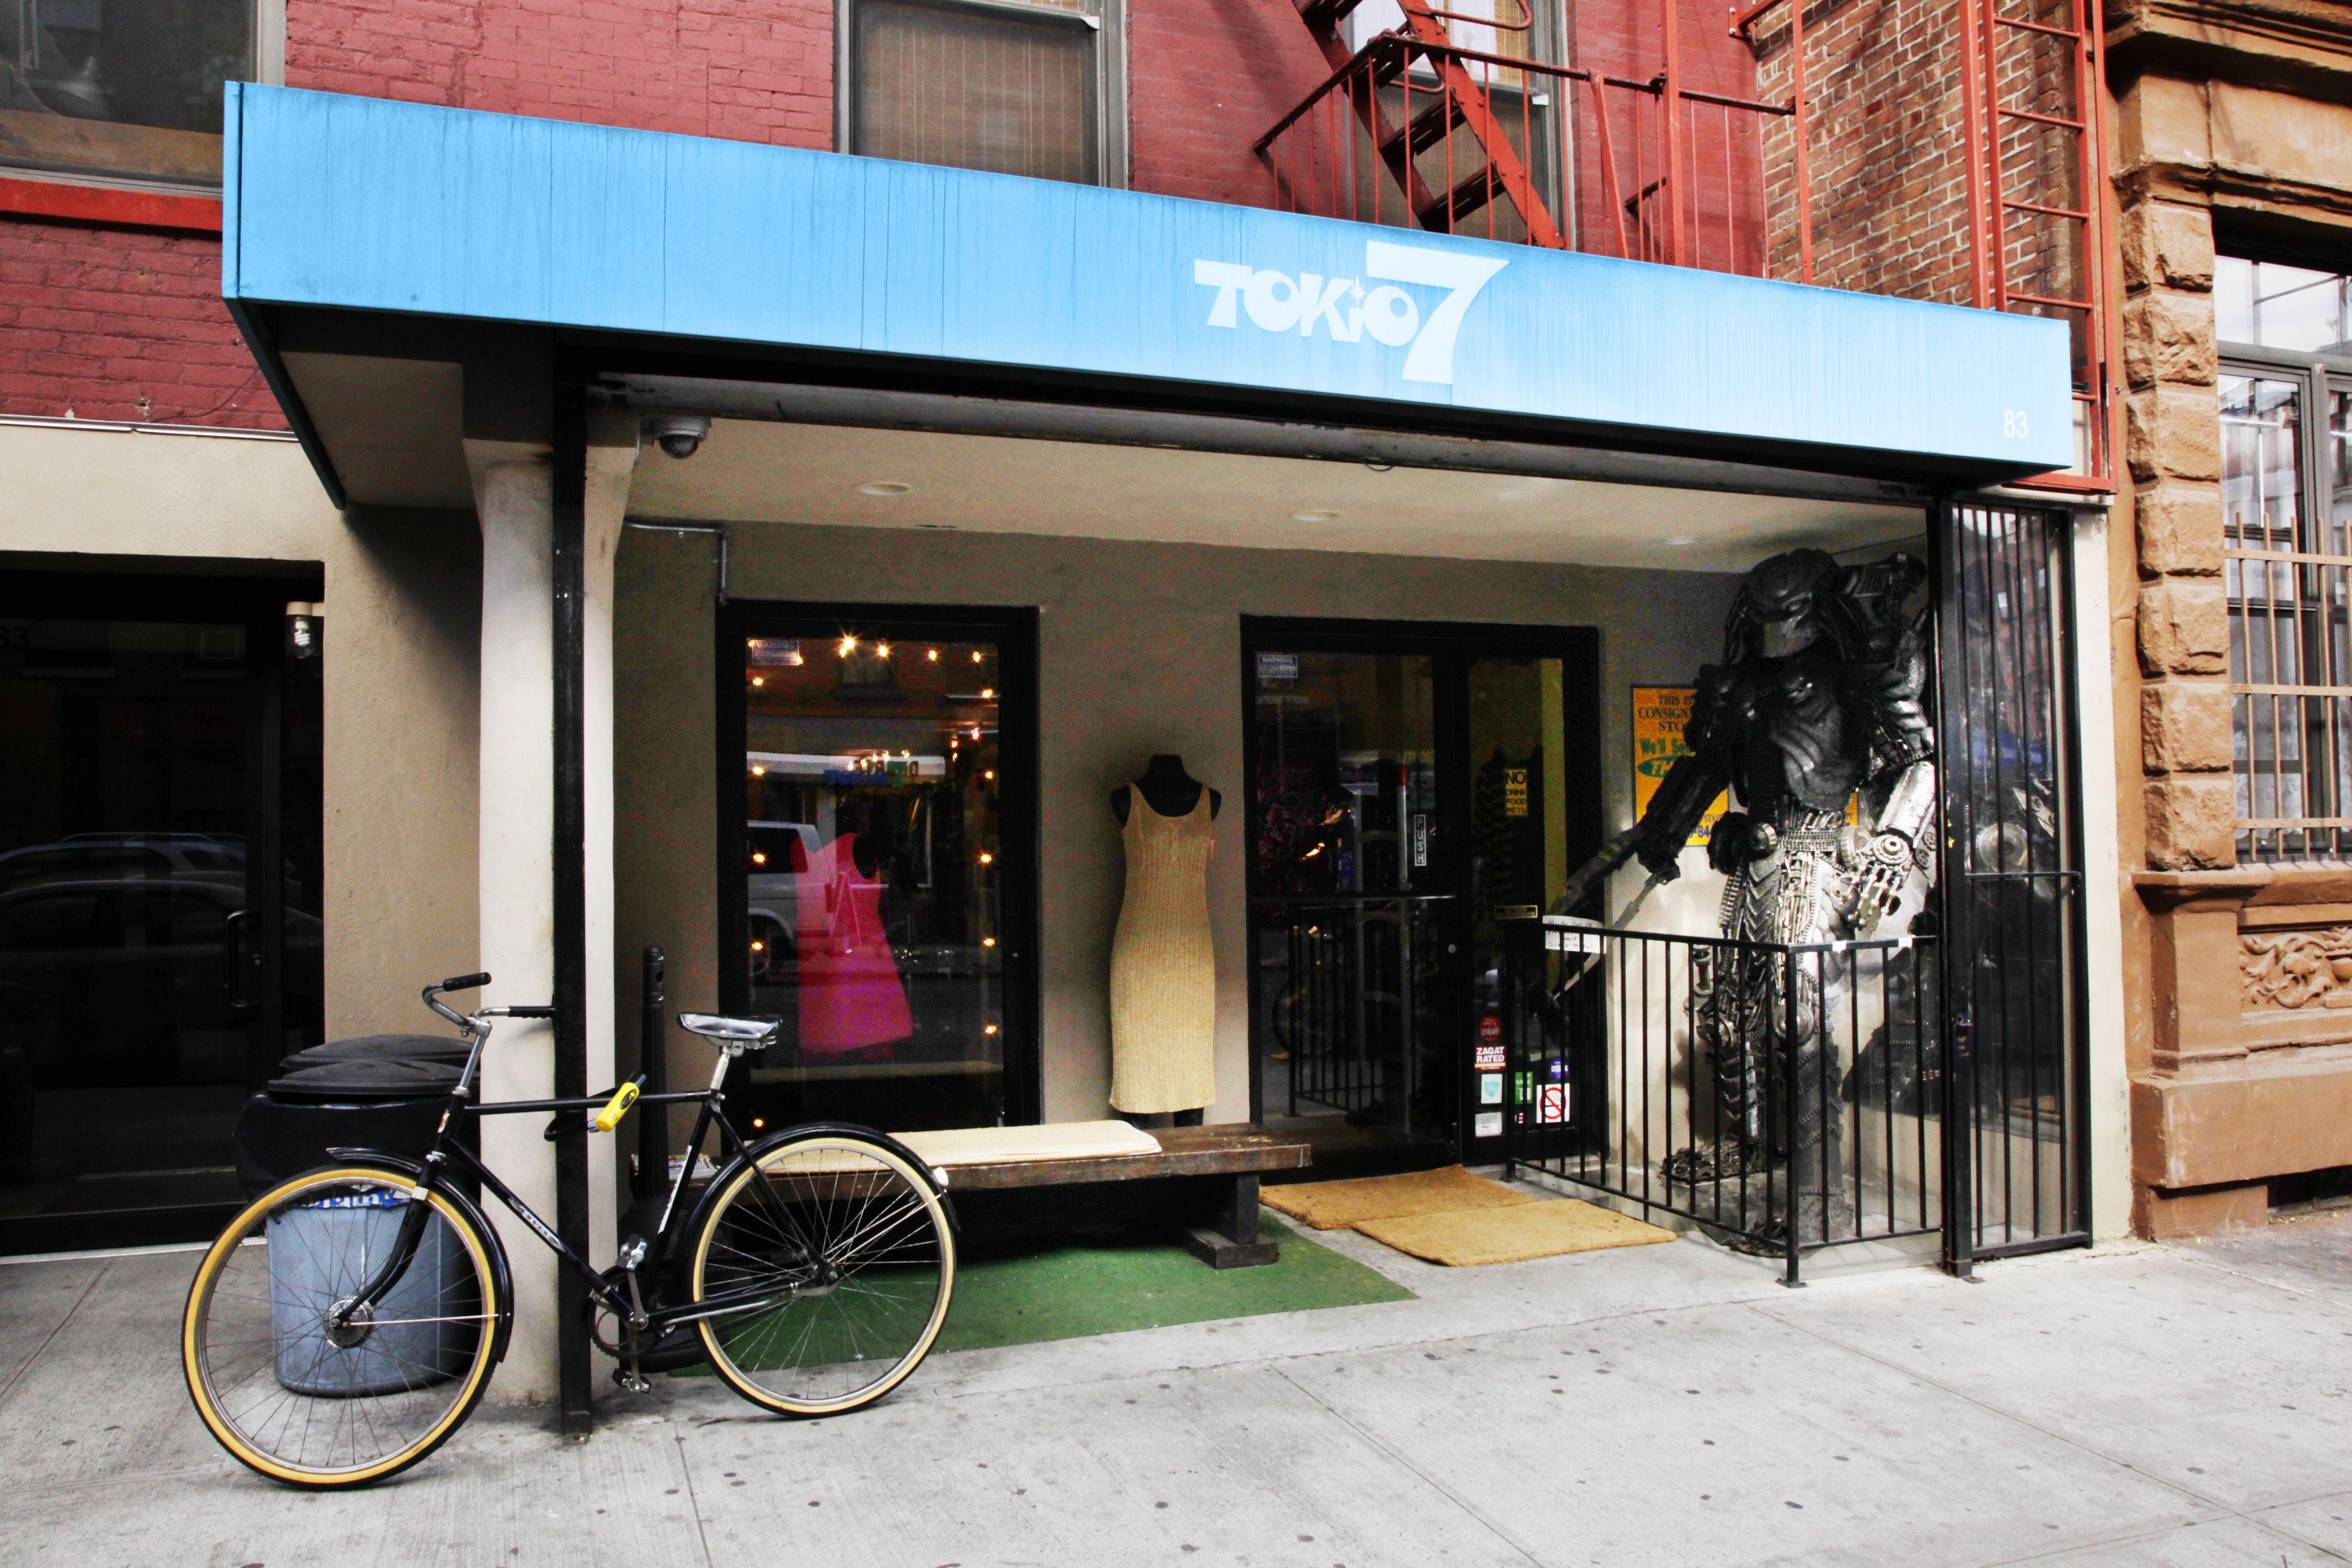 Tokio 7 – East Village, NYC #nyc #nycshopping #shopping #vintageshopping #eastvillage [Photo: Alexander Thompson/NYC & Company]